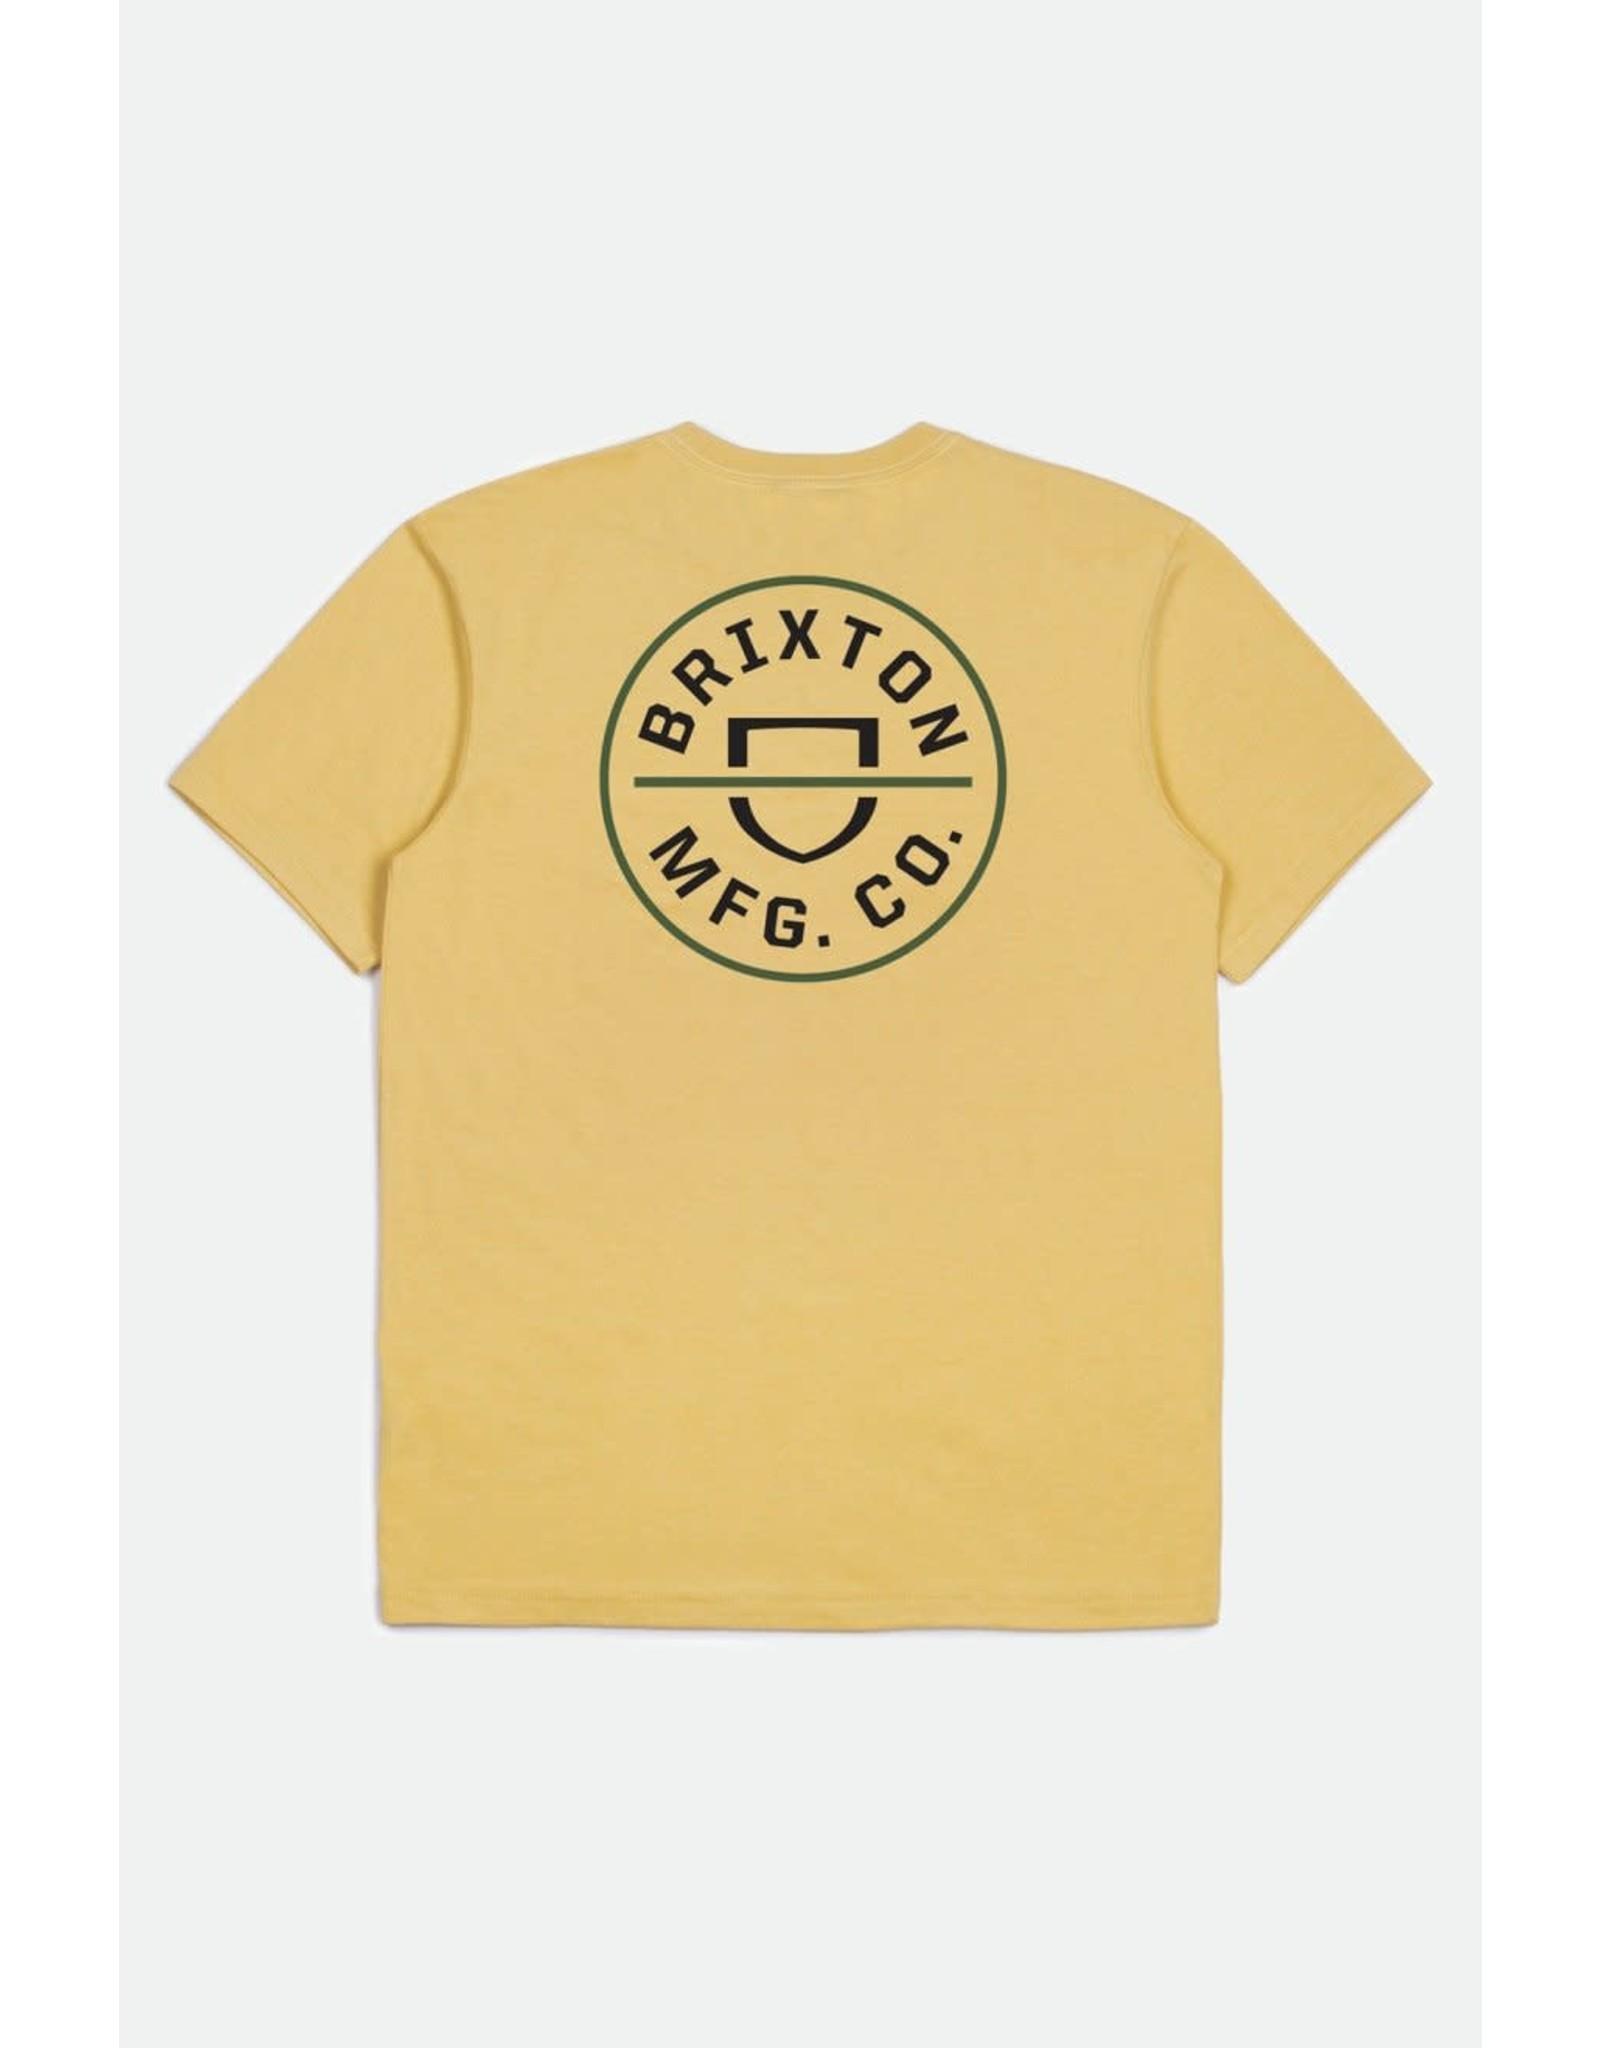 Brixton Brixton - T-shirt homme crest II stt antique gold/black